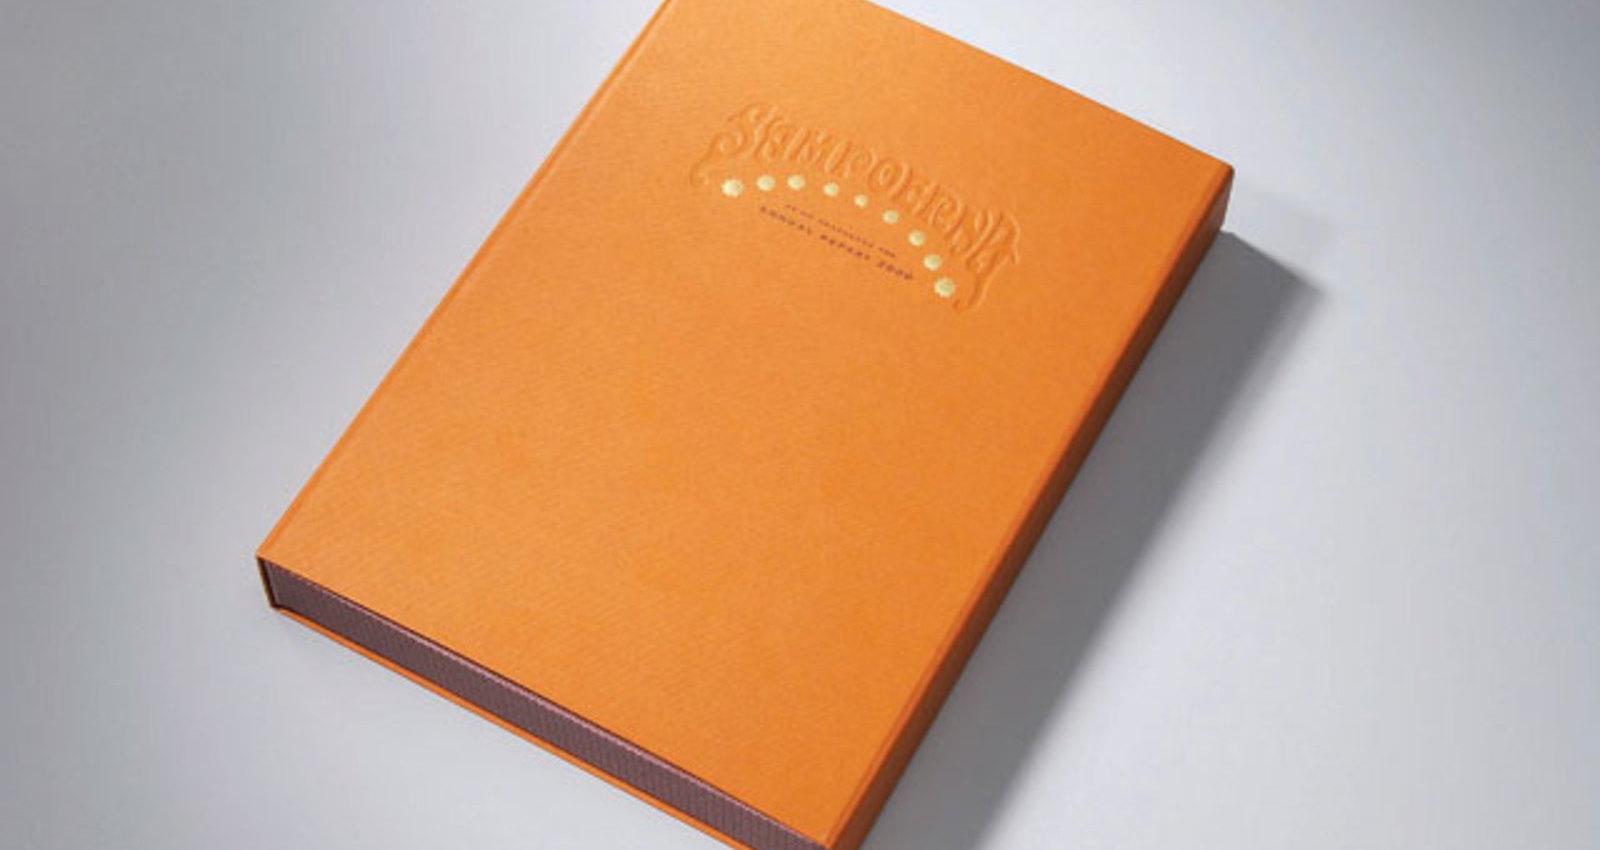 Sampoerna Annual Report 2000